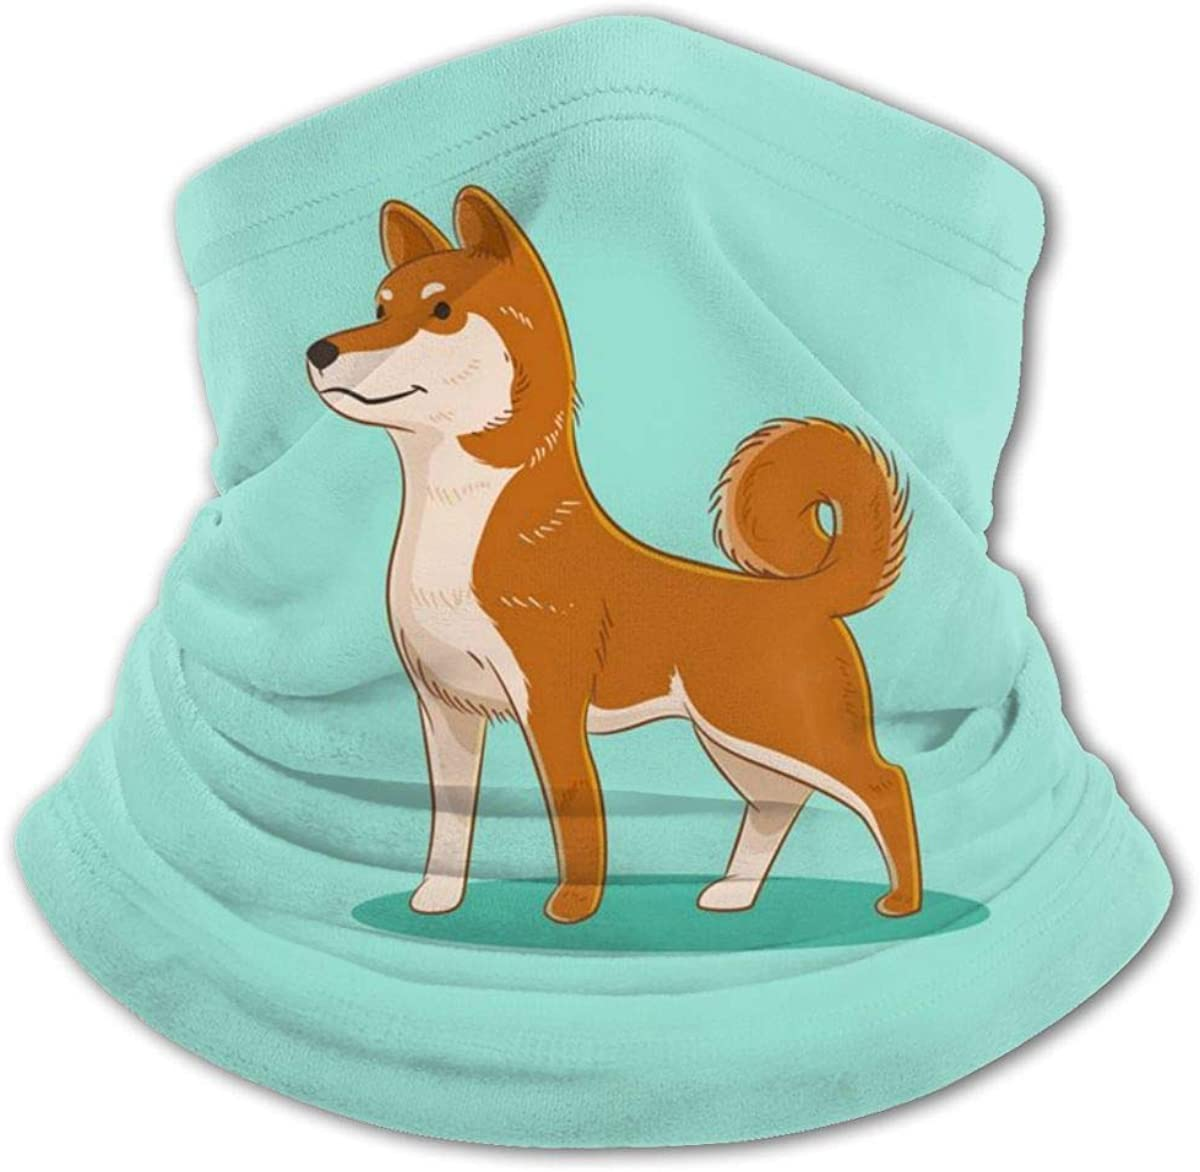 Shiba Inu Dog Headwear For Girls And Boys, Head Wrap, Neck Gaiter, Headband, Tenn Fishing Mask, Magic Scarf, Tube Mask, Face Bandana Mask For Camping Running Cycling